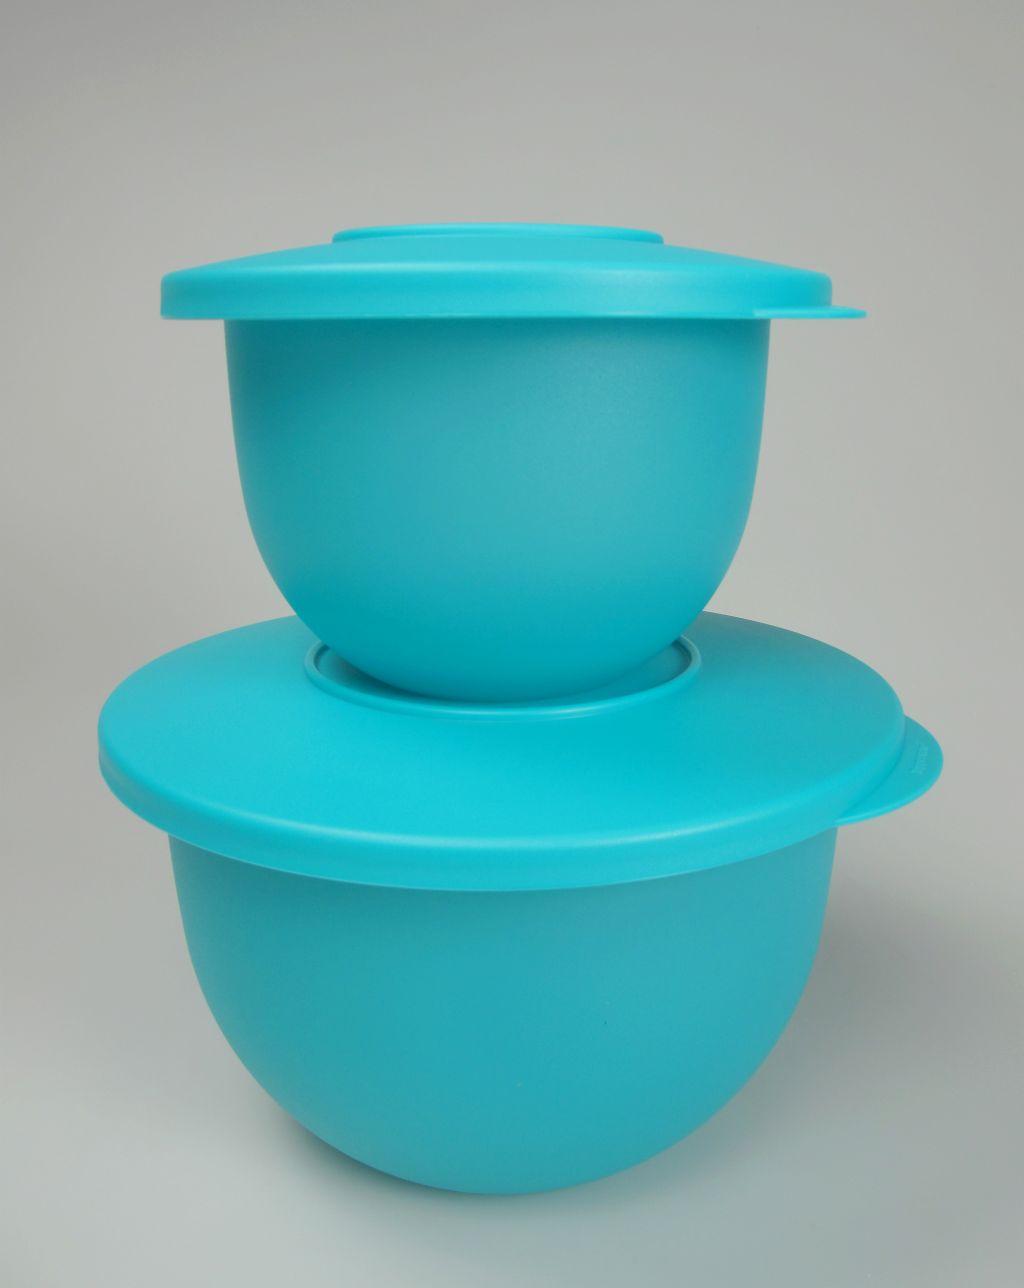 tupperware duo set junge welle 1 3 l sch ssel 550 ml sch ssel t rkis 2 ebay. Black Bedroom Furniture Sets. Home Design Ideas